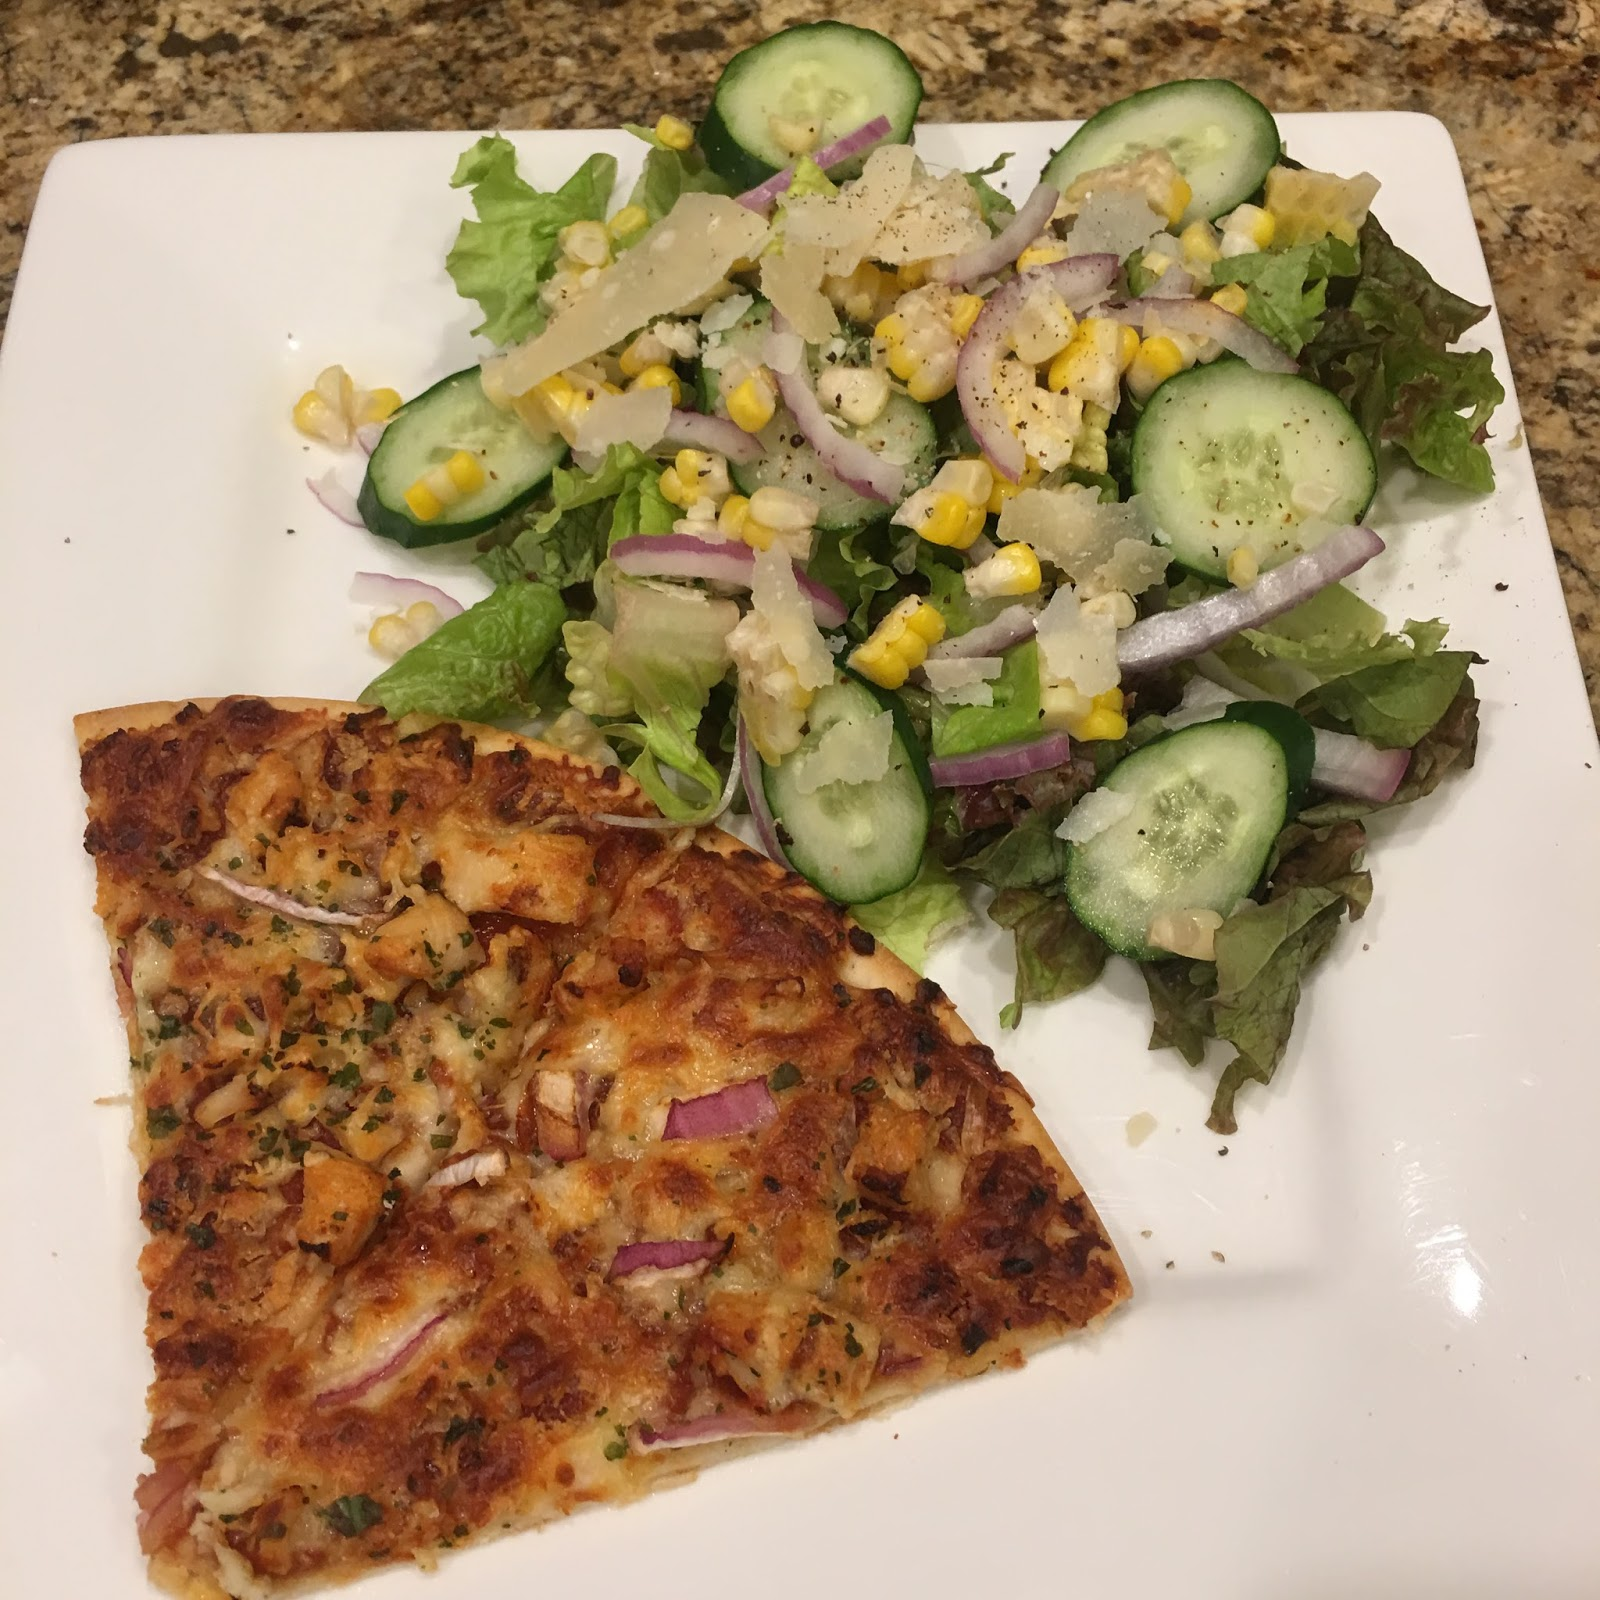 California Pizza Kitchen Bbq Chicken Pizza Directions